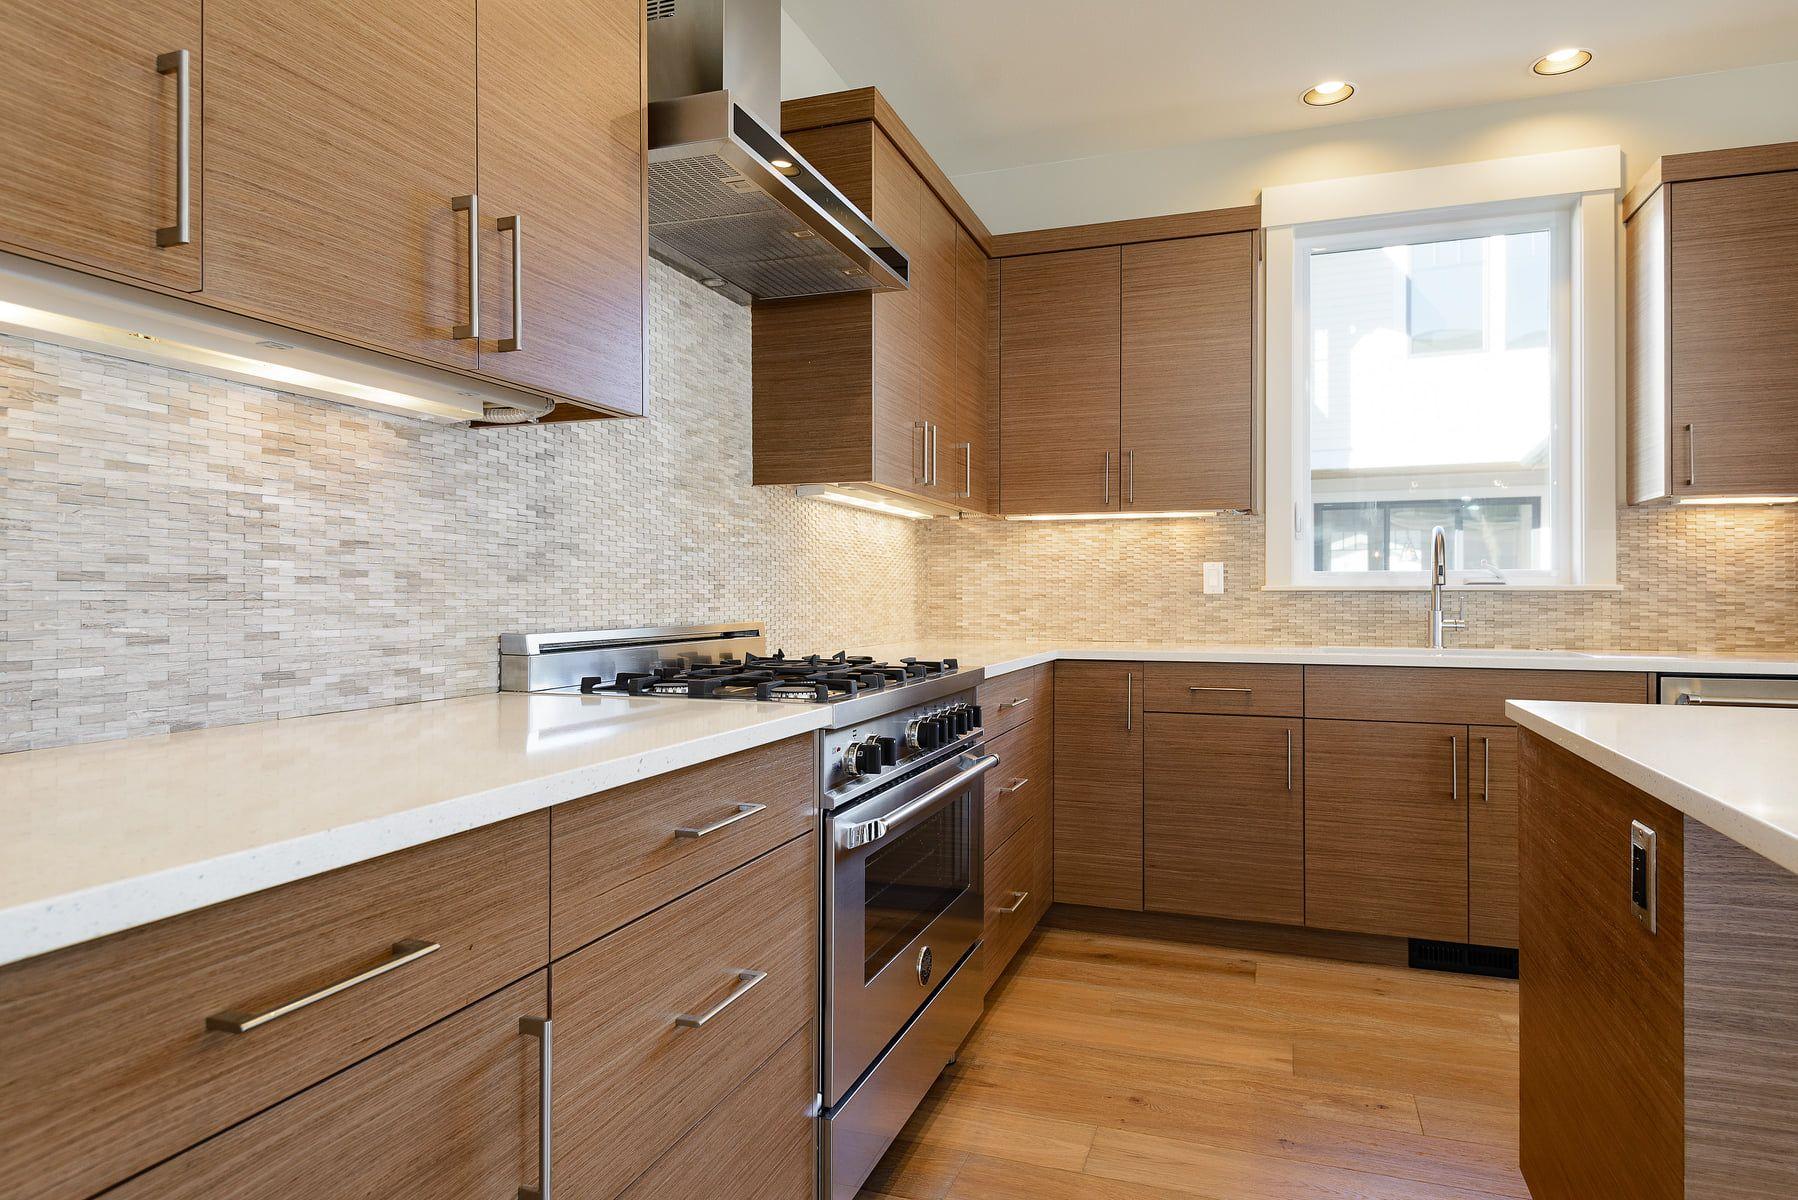 Kitchen Cabinets In 2020 Kitchen Cabinet Custom Cabinets